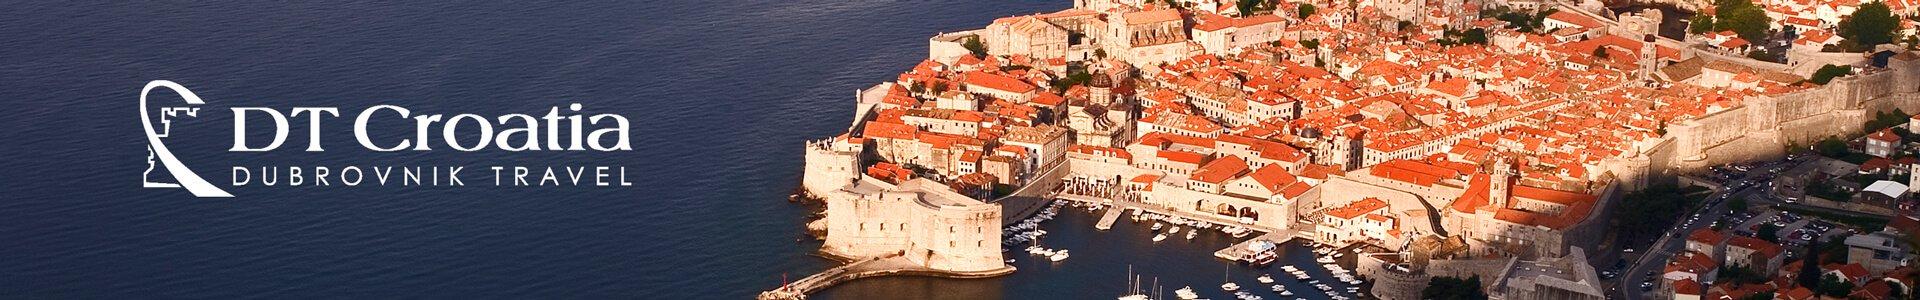 DT-Croatia Dubrovnik DMC